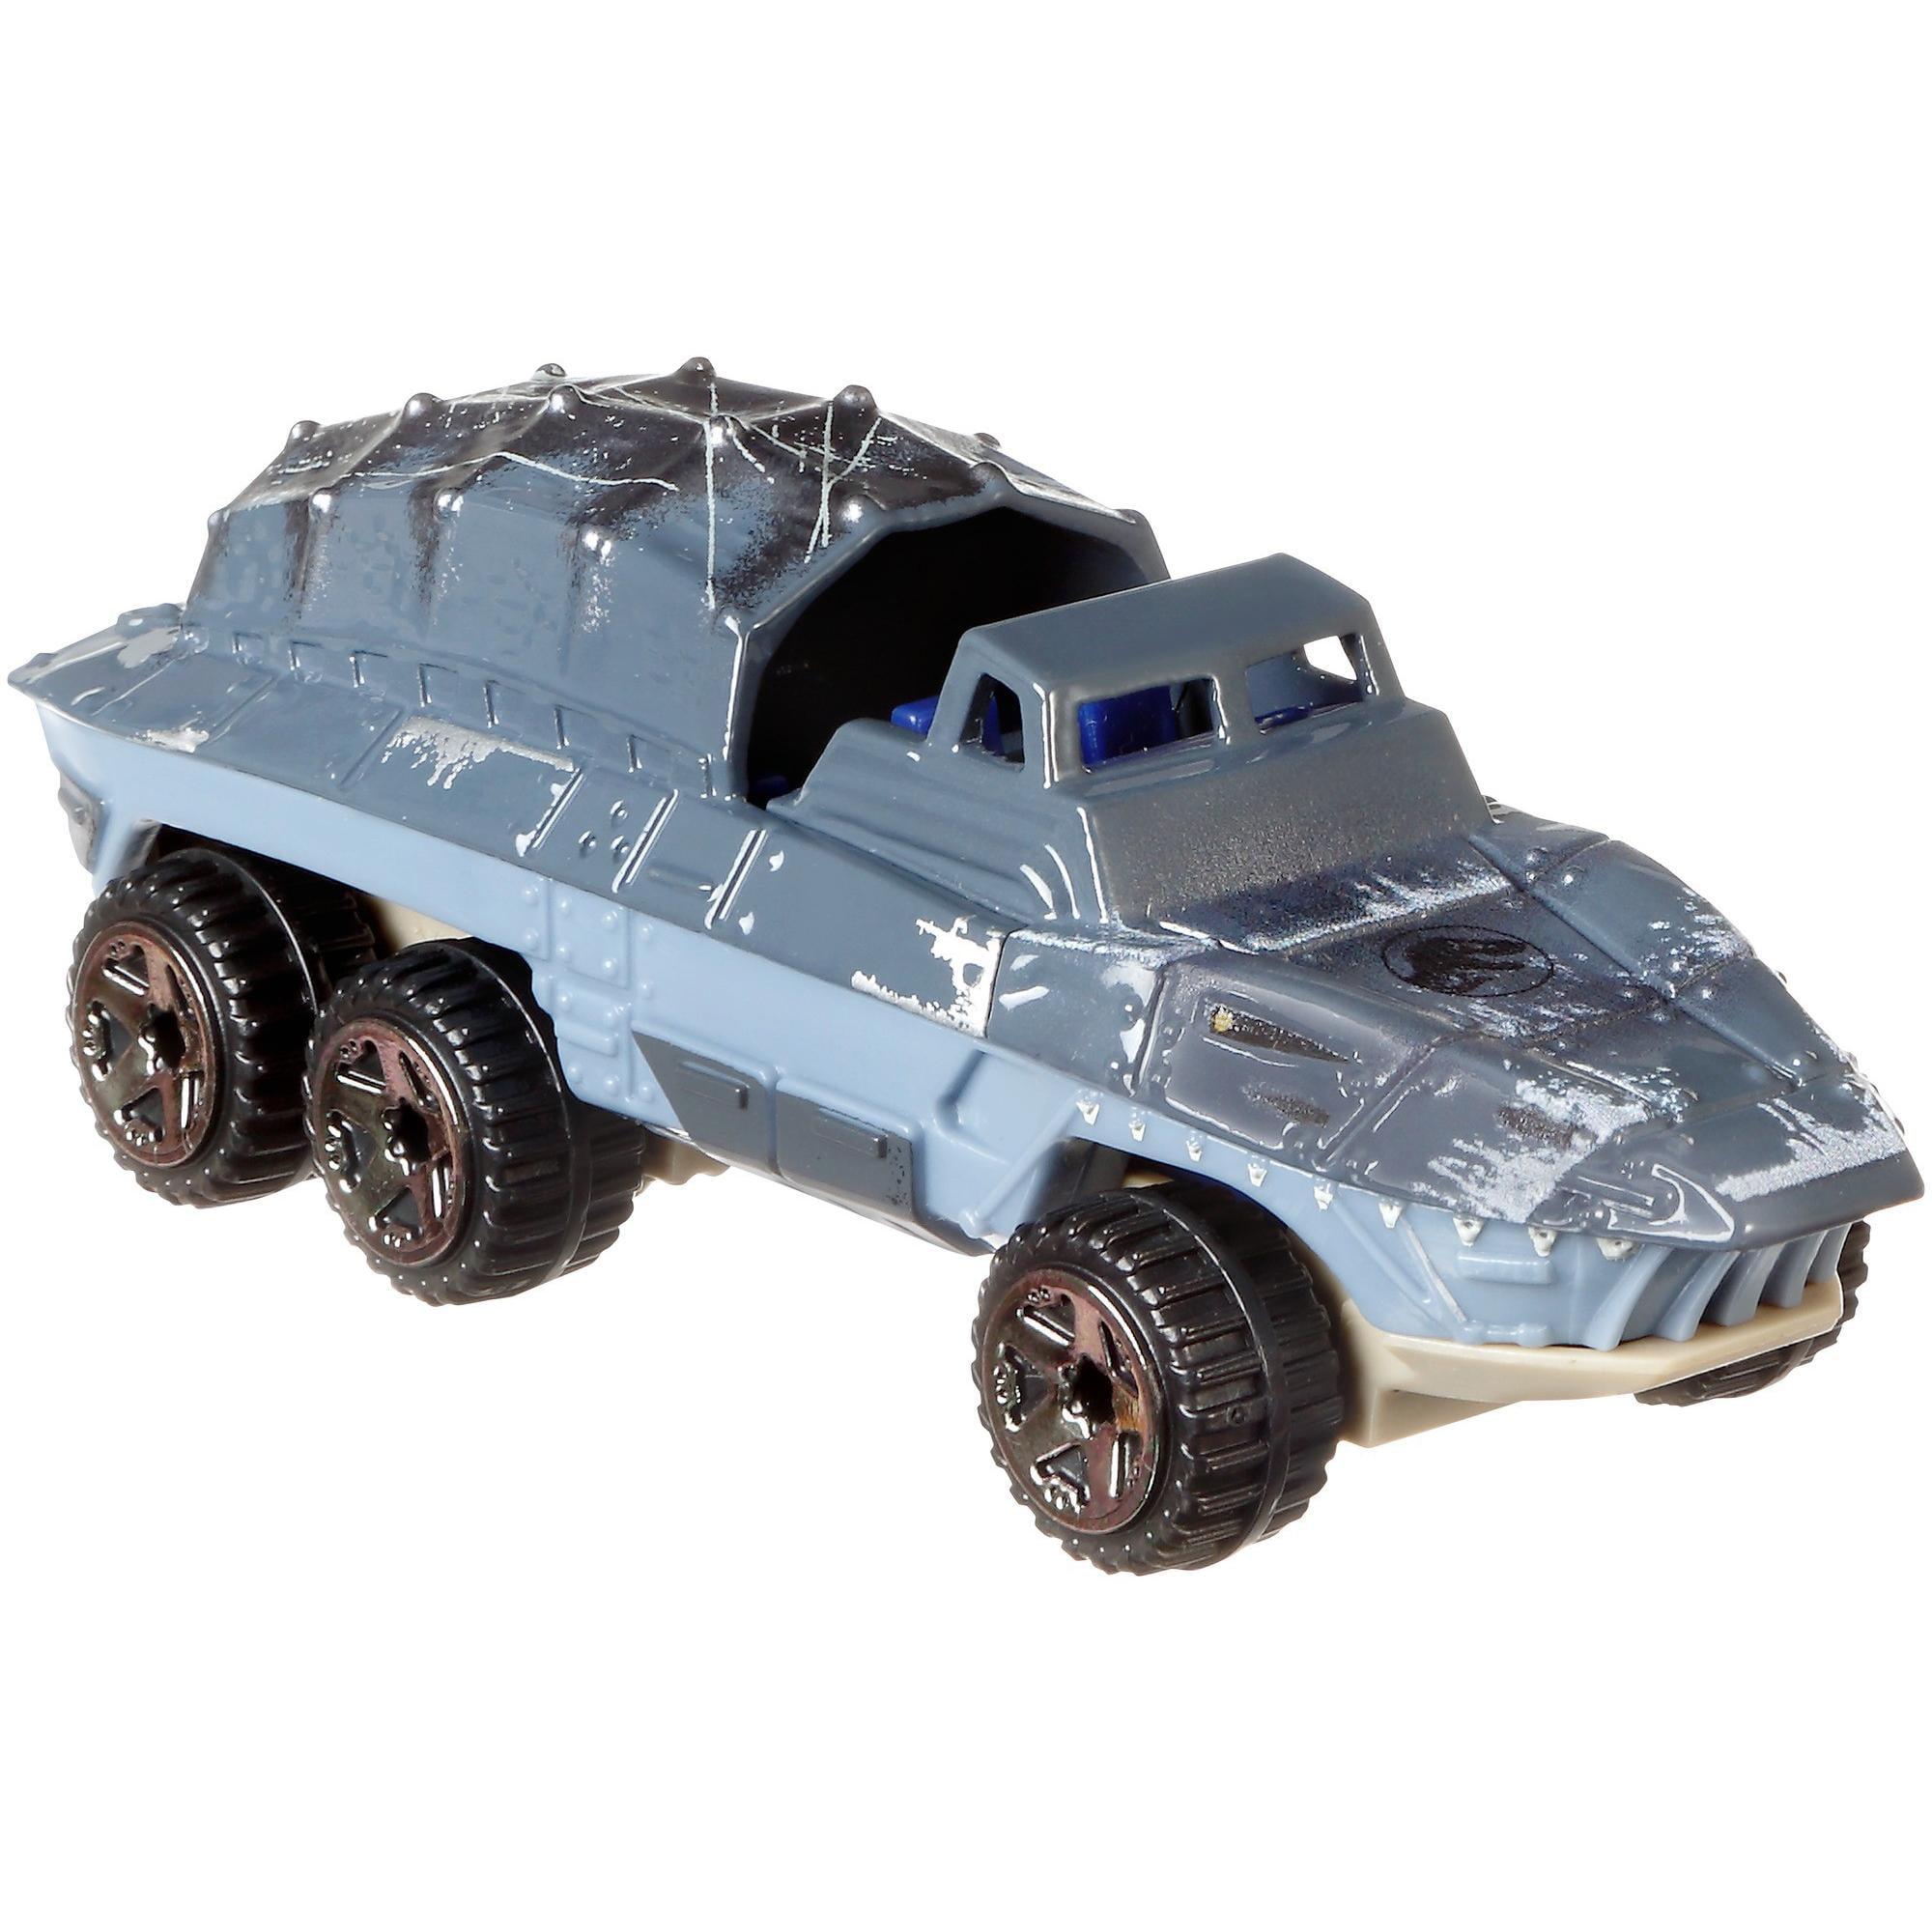 Hot Wheels Jurassic World Mosasaurus, Vehicle by Mattel